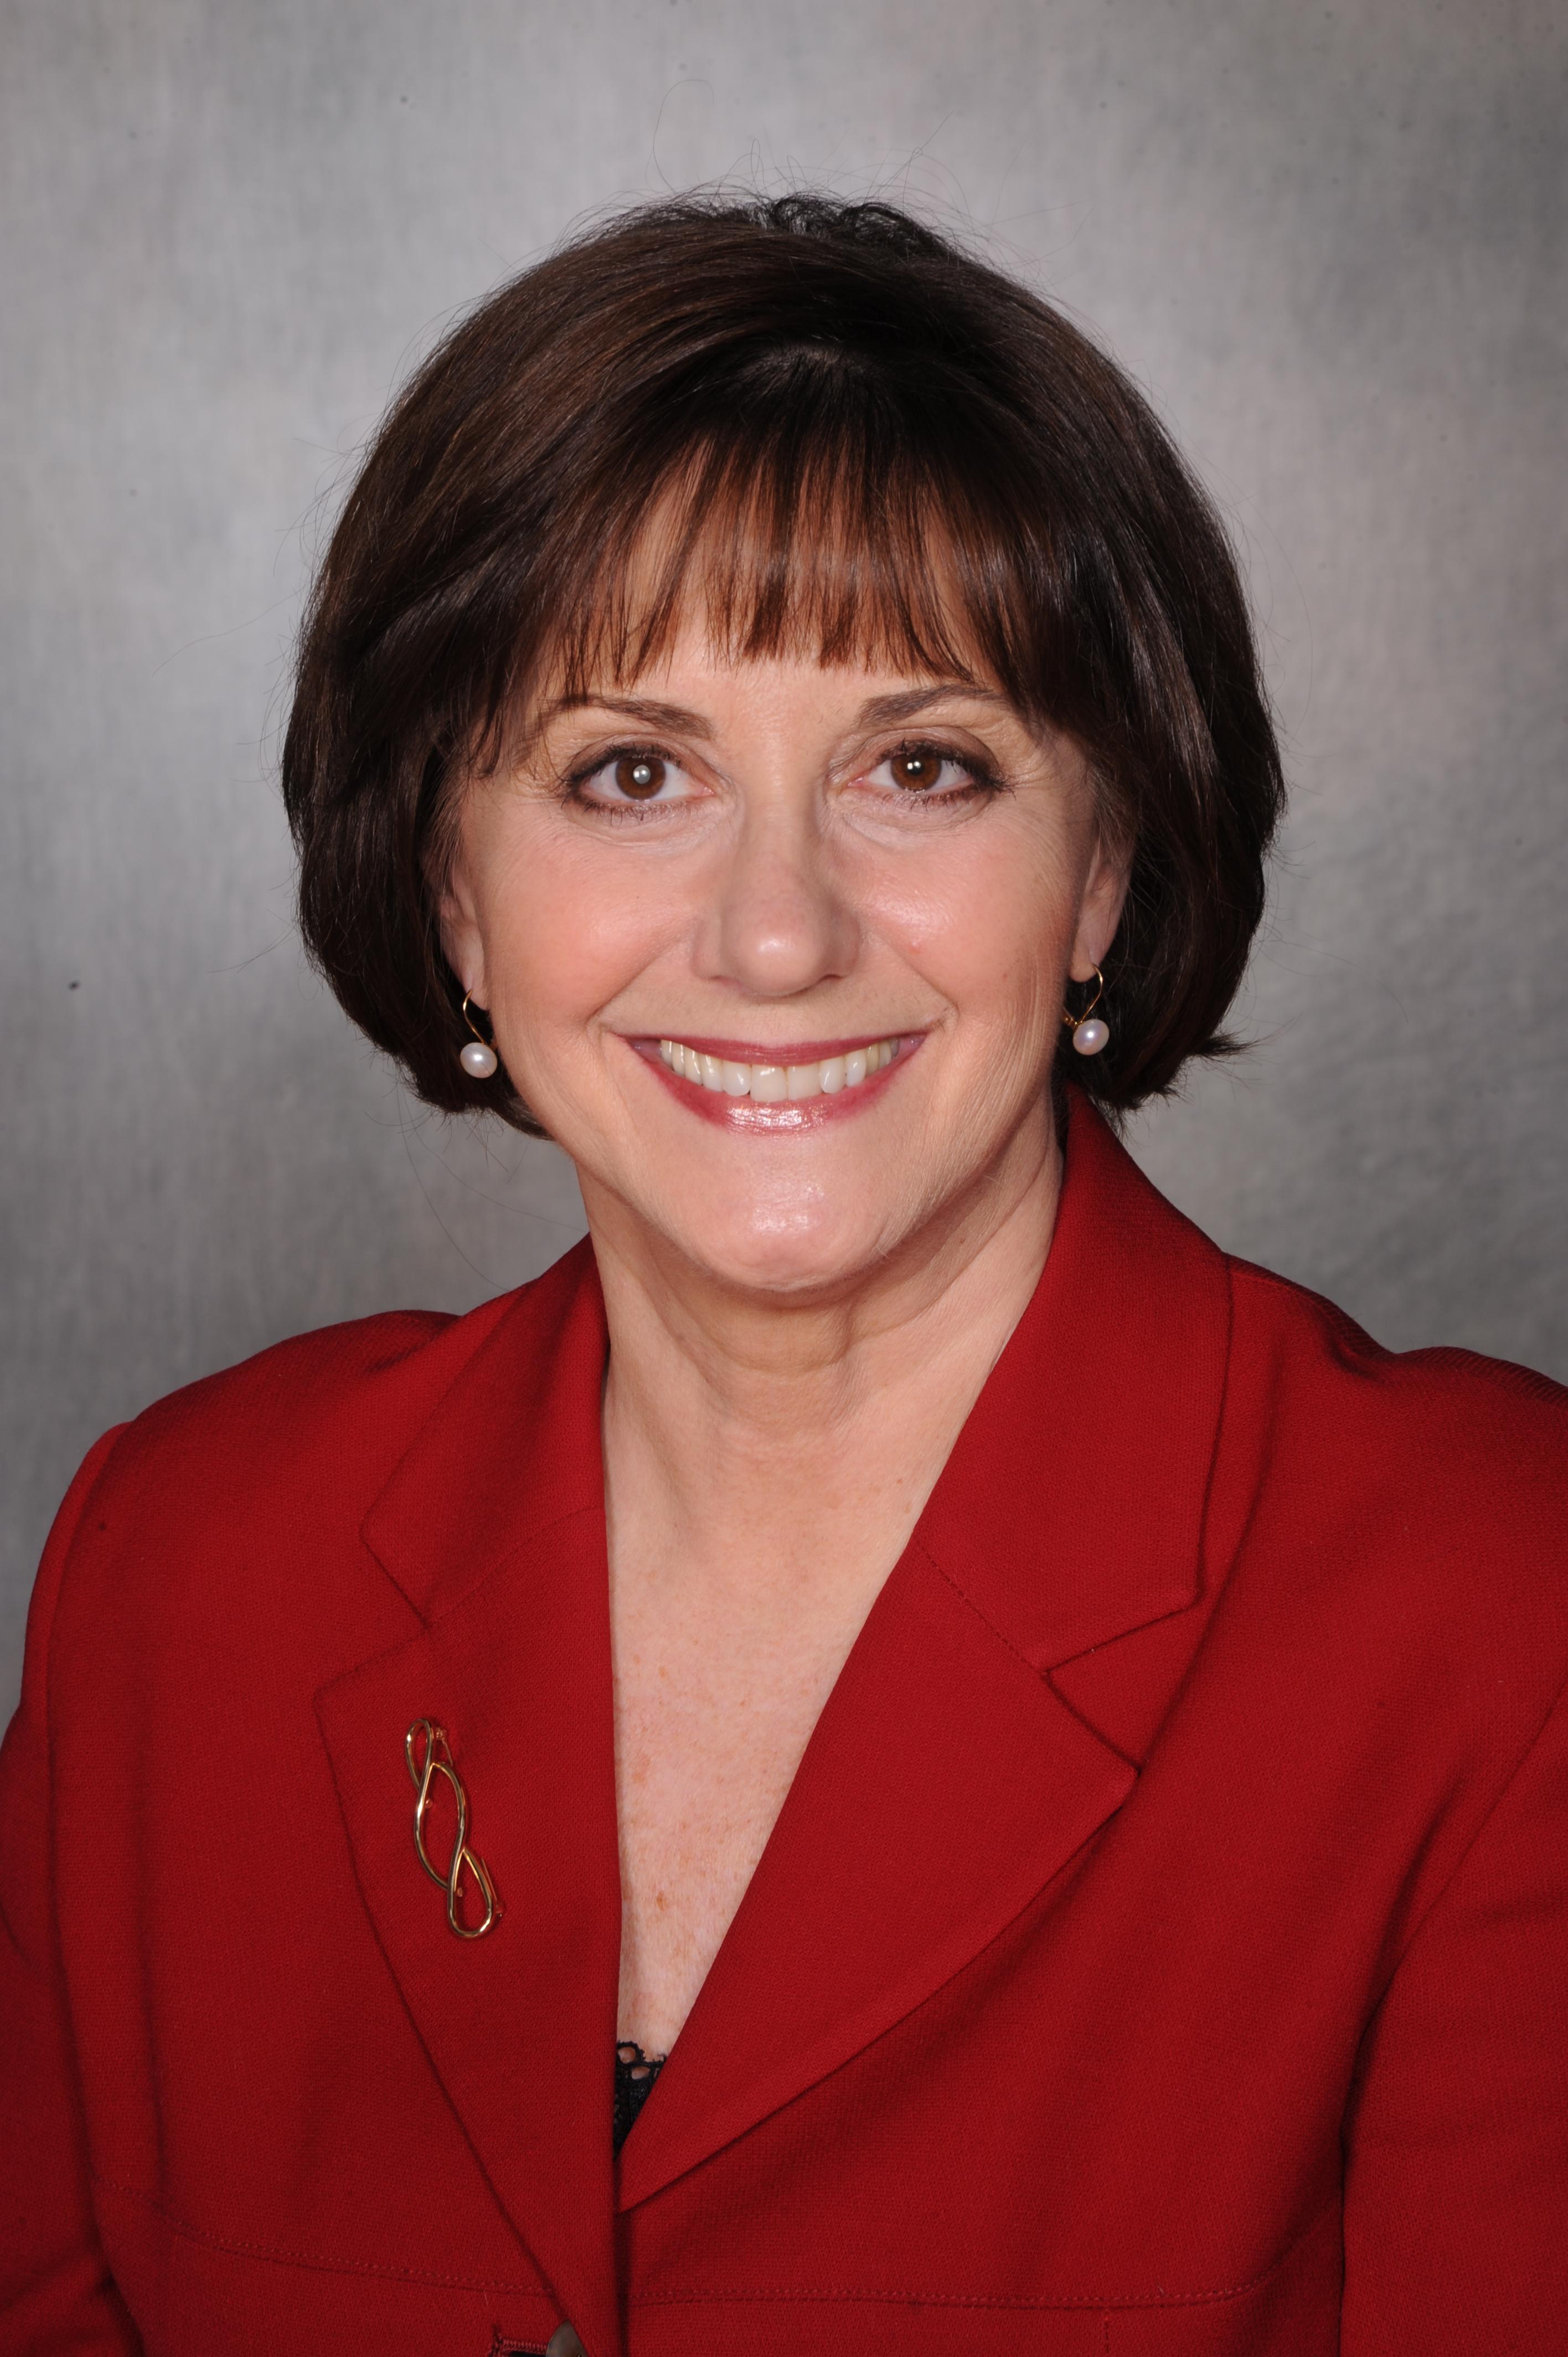 Rita Novak - Special Advisor to the Board